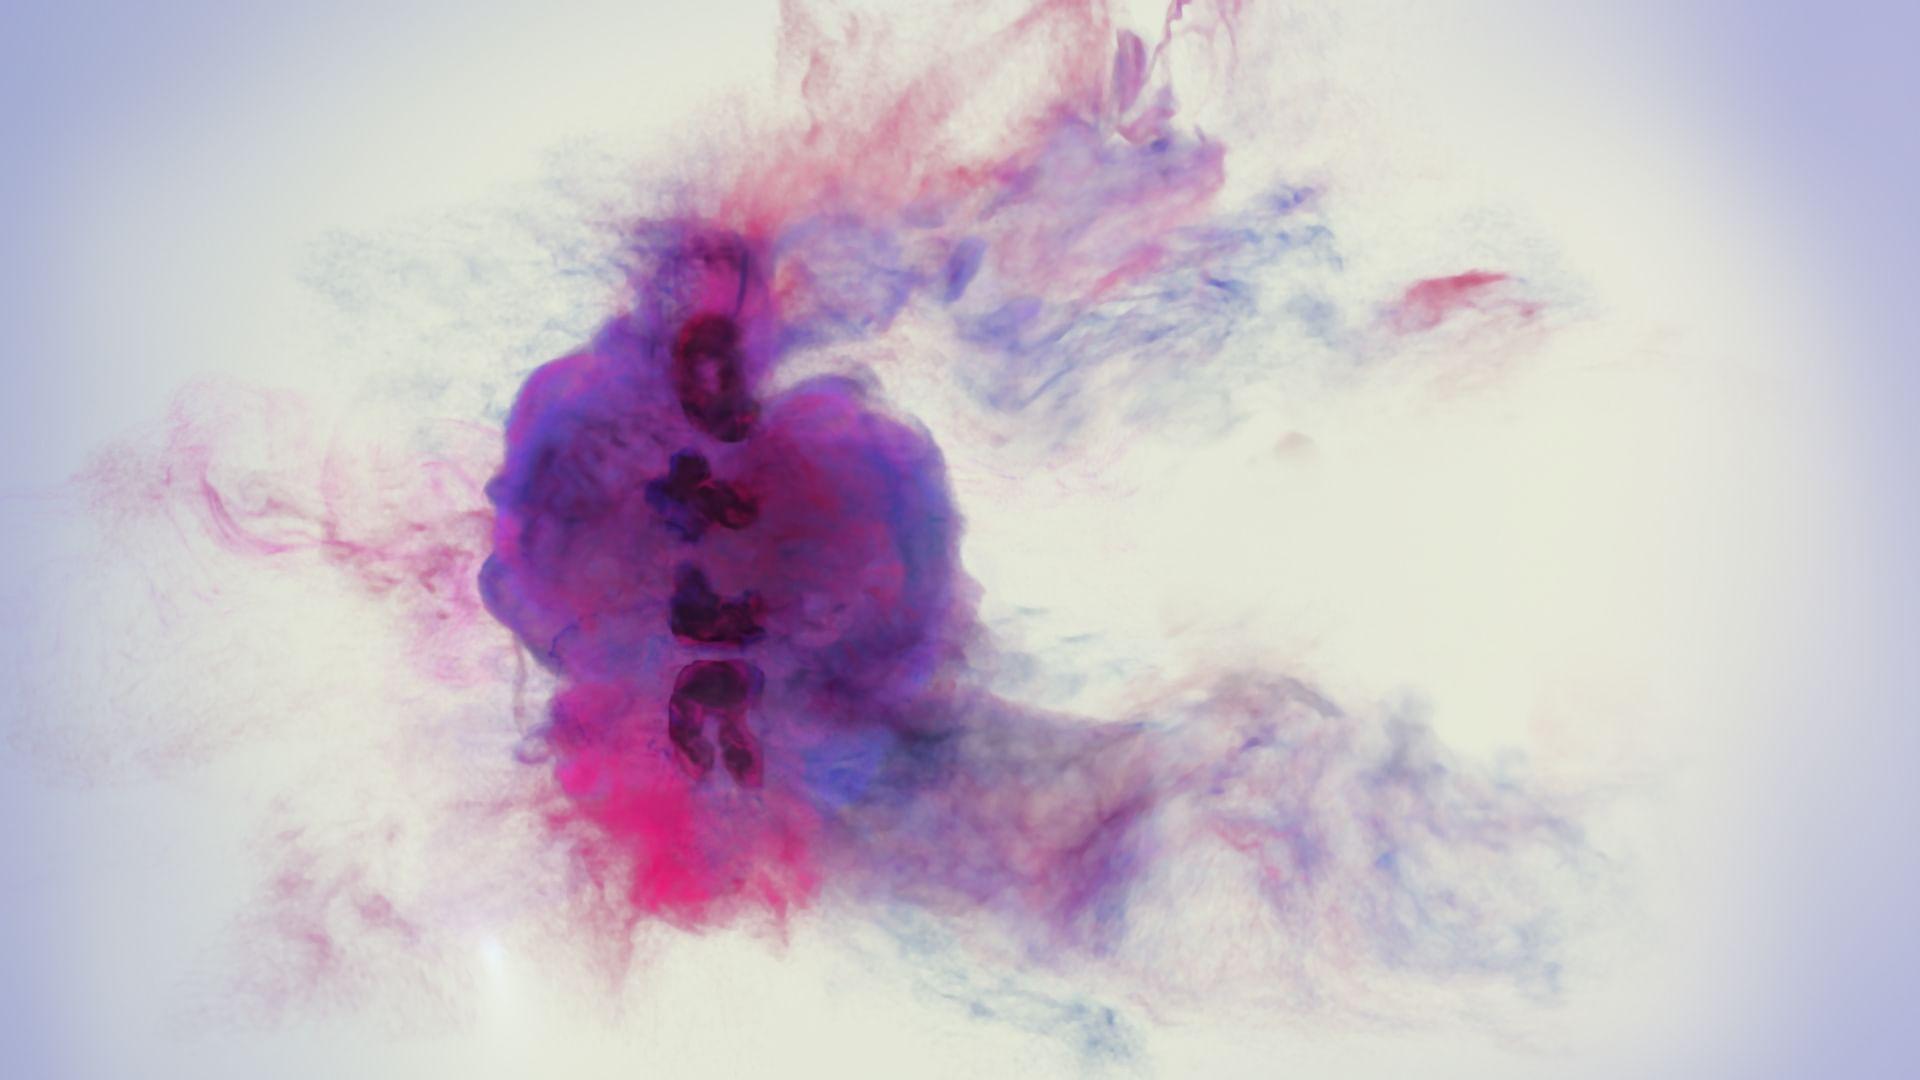 """Donkeyote"", un film de Chico Pereira"